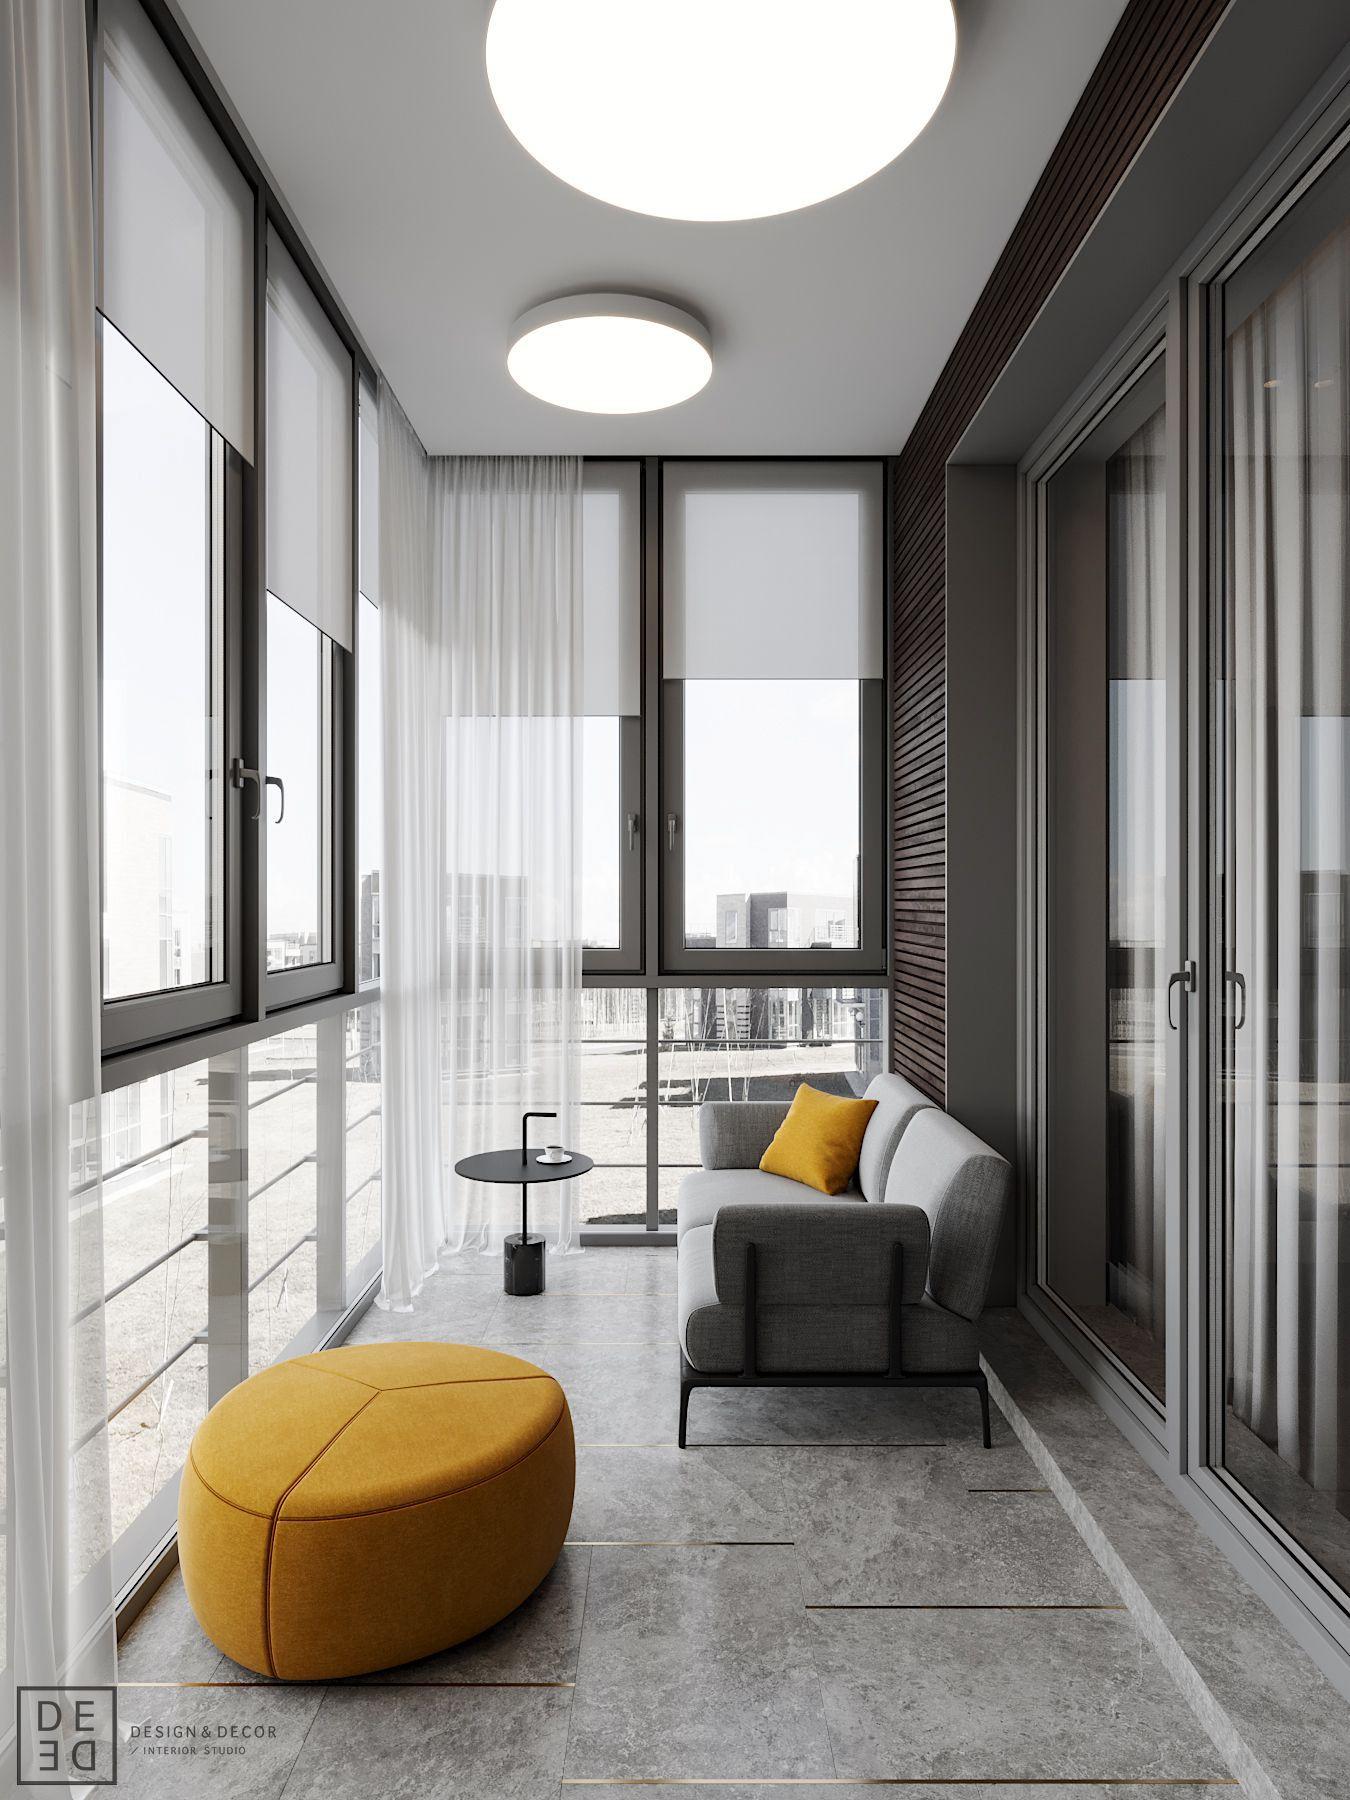 de de wooden luxury on behance projects to try in 2018 interior rh pinterest com